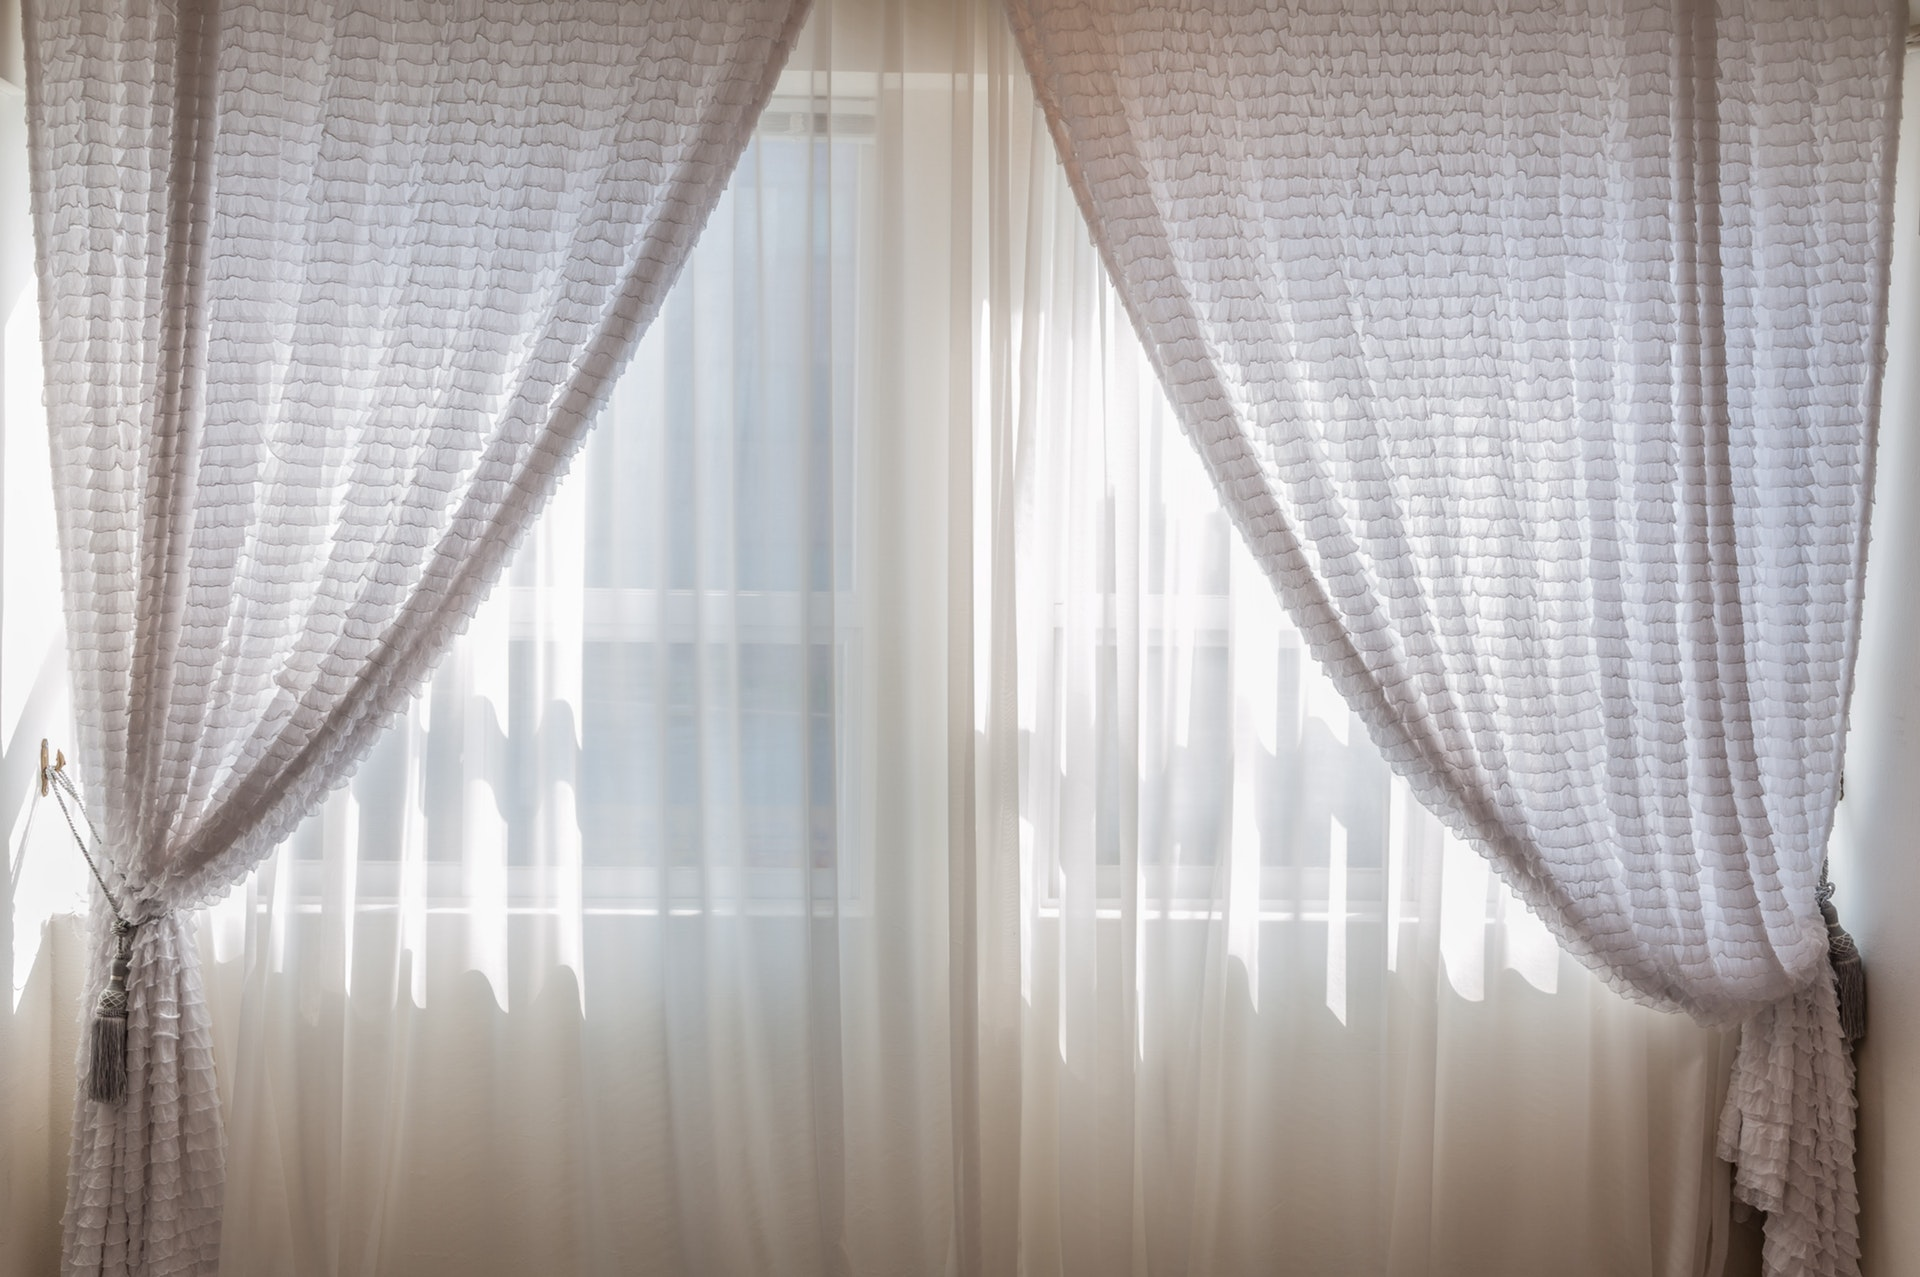 contemporary-cozy-curtain-462197.jpg